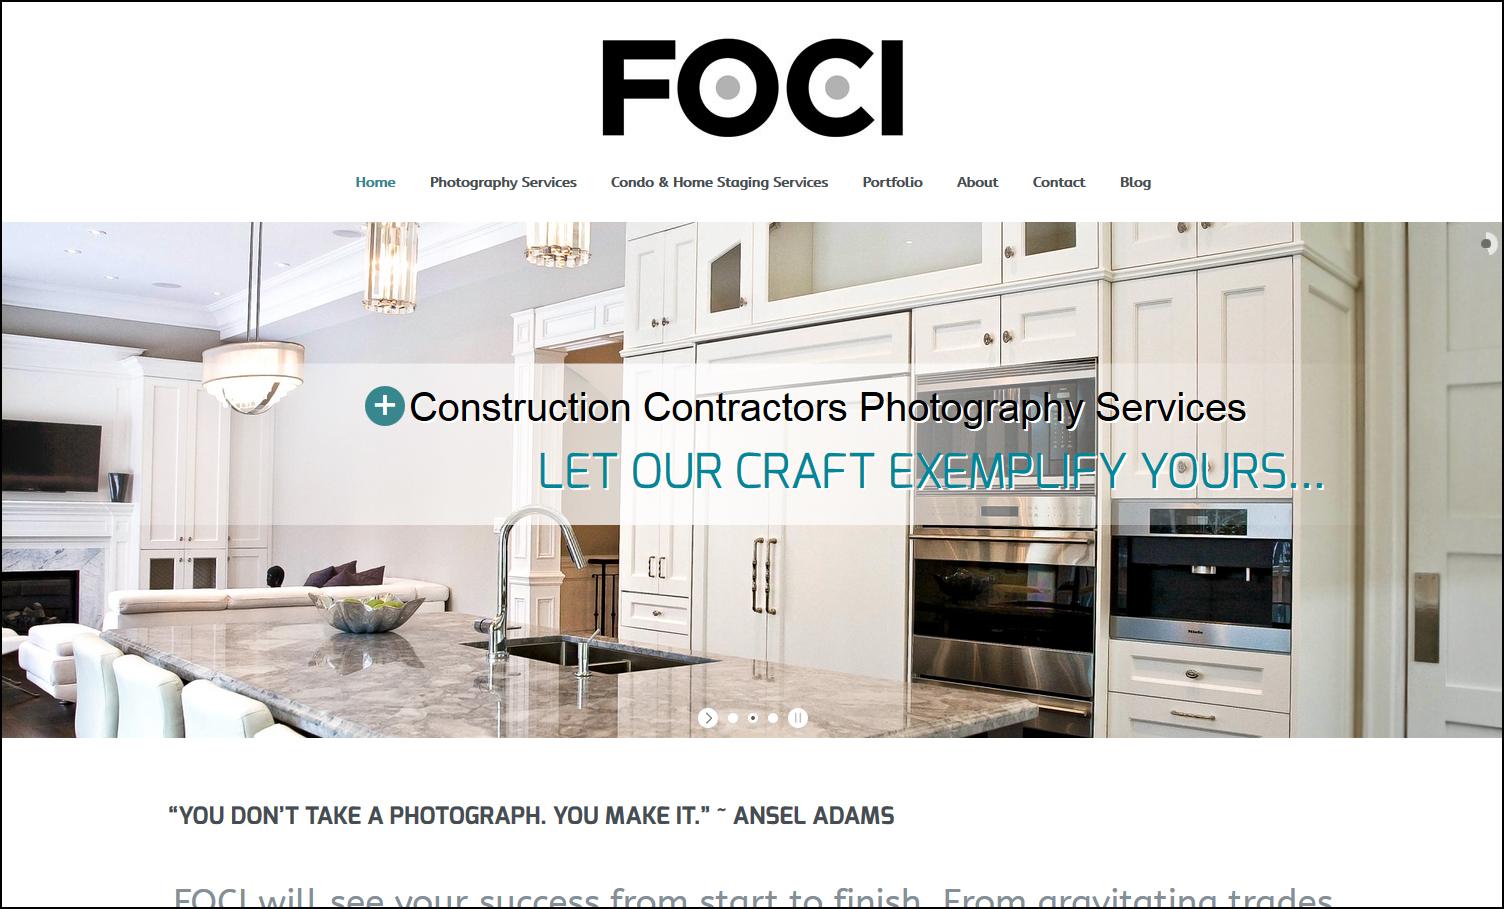 foci-photography